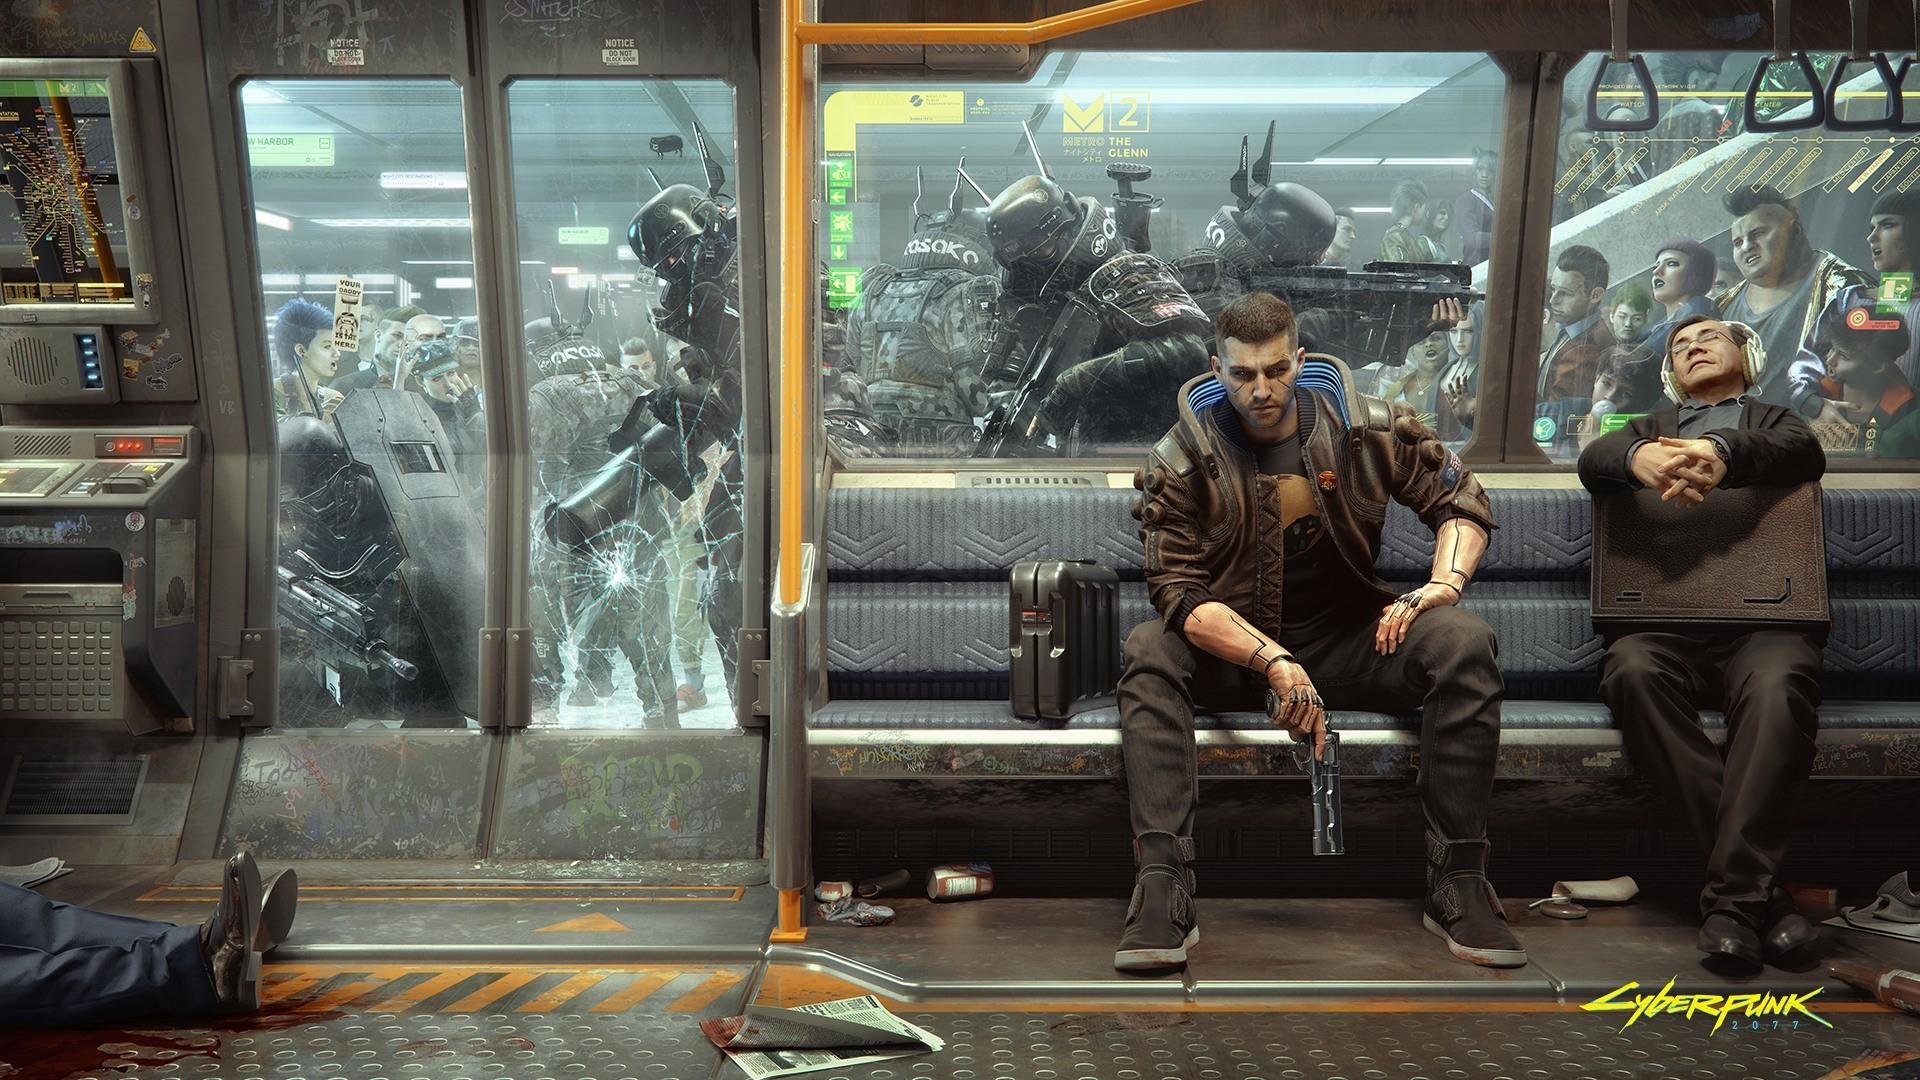 Cyberpunk 2077 Metro Wall